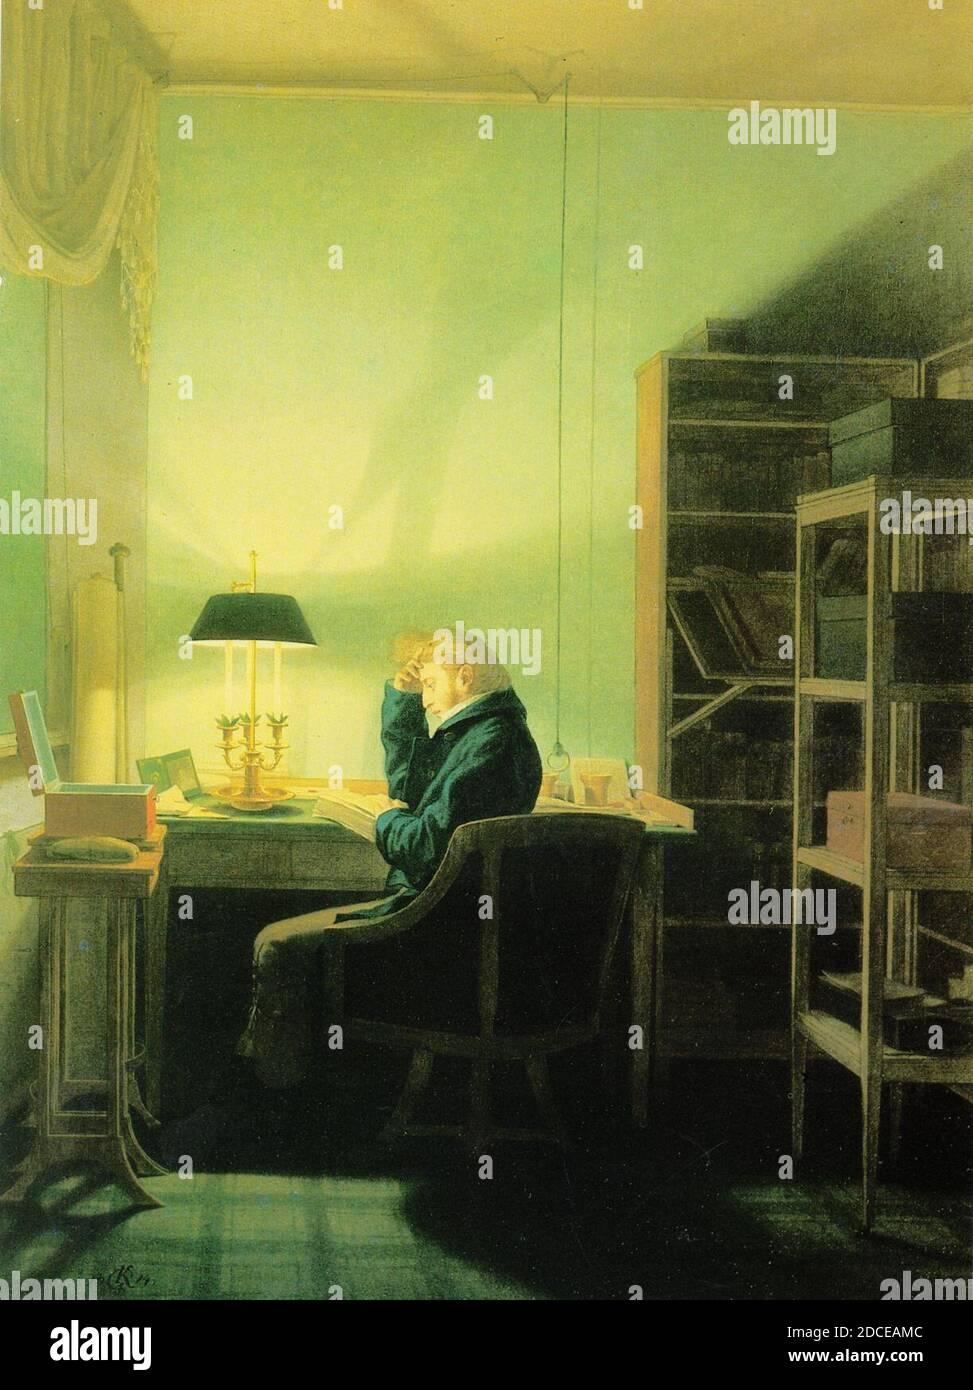 Kersting - Leser Mann beim Lampenlicht Stockfotografie - Alamy